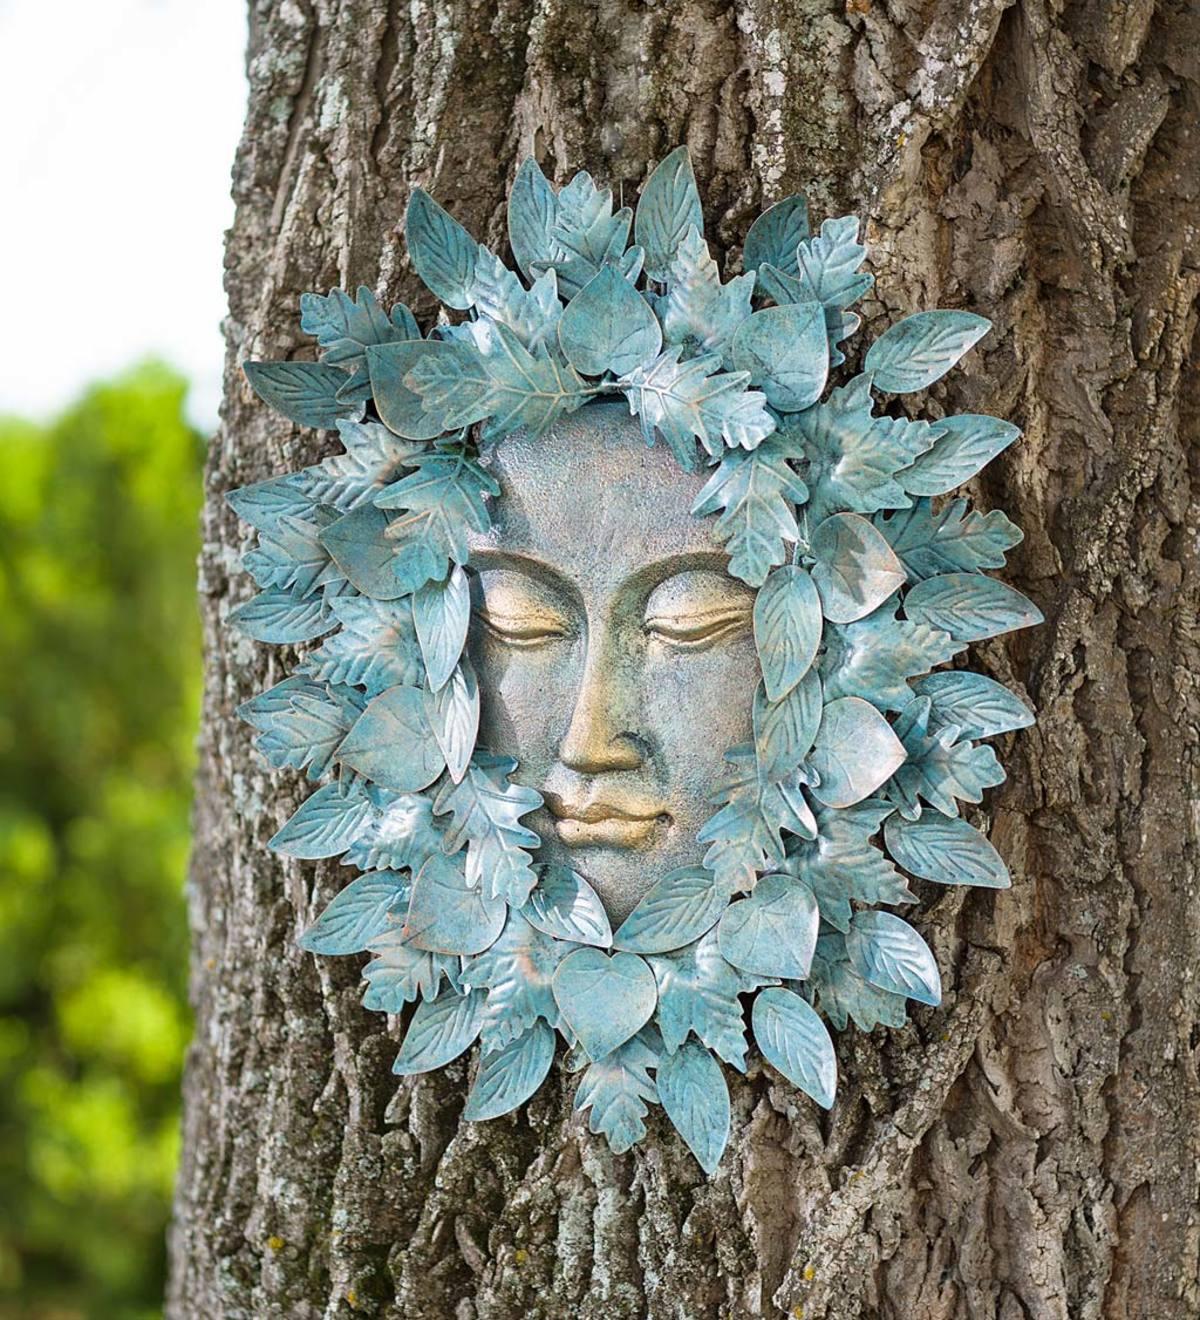 Green Man Bird Bath Feeder Decorative Garden Ornament Wall Plaque Dish GIft